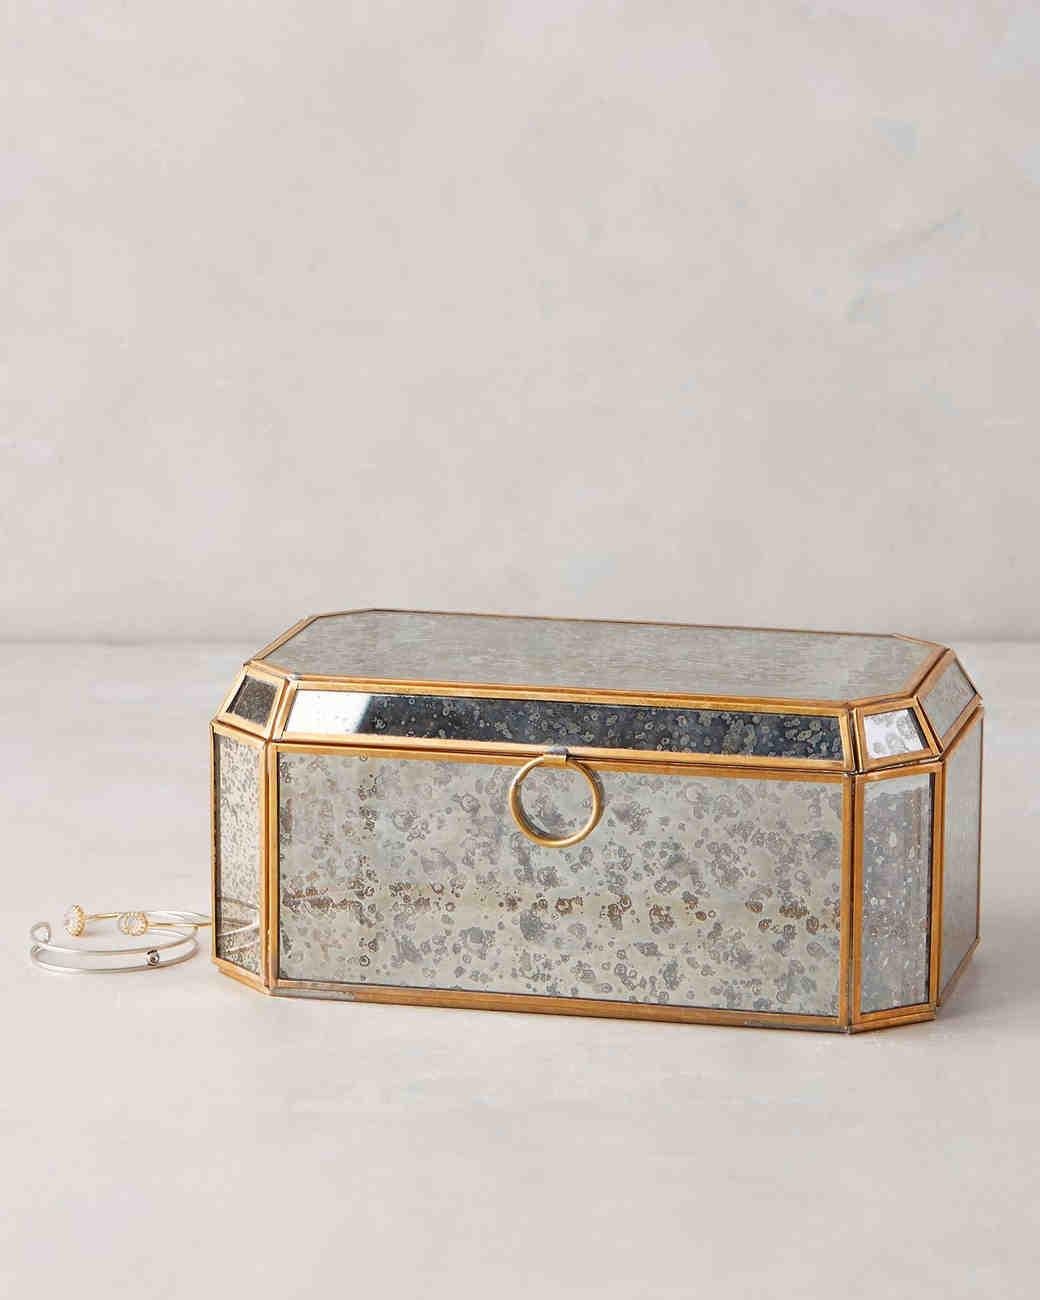 last-minute-gift-ideas-anthro-jewelry-box-1215.jpg